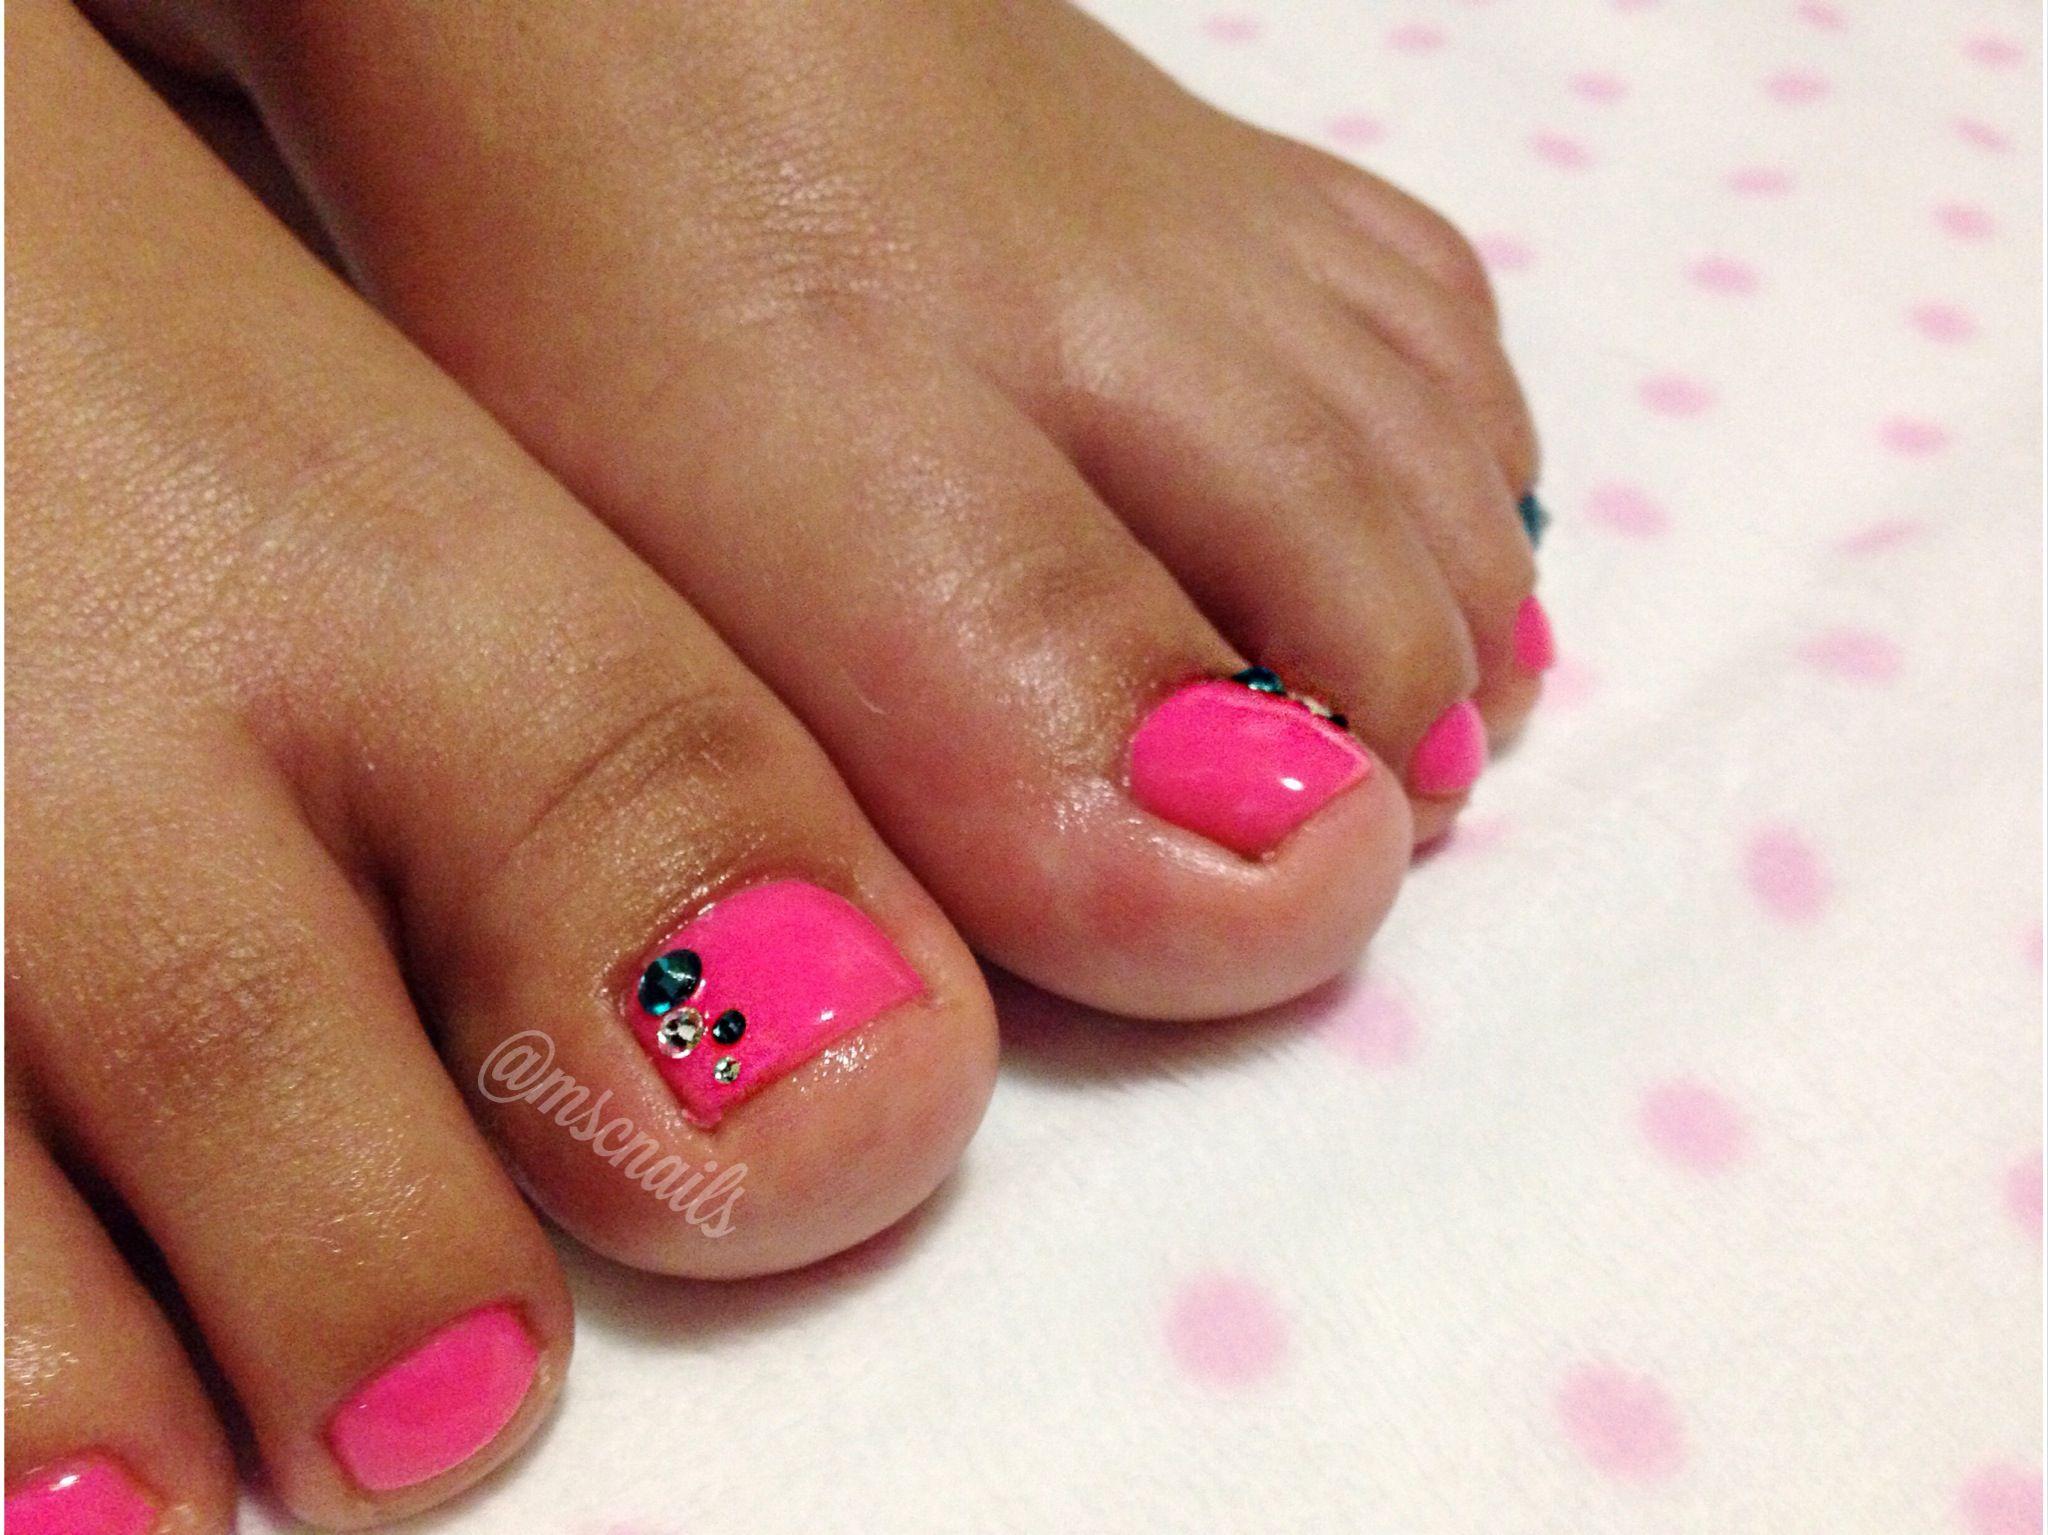 #mscnails #msc #nails #uñas #pedicure #pedicura #swarovski #pink #semilac #diamondcosmetics #summer #beauty #fashion